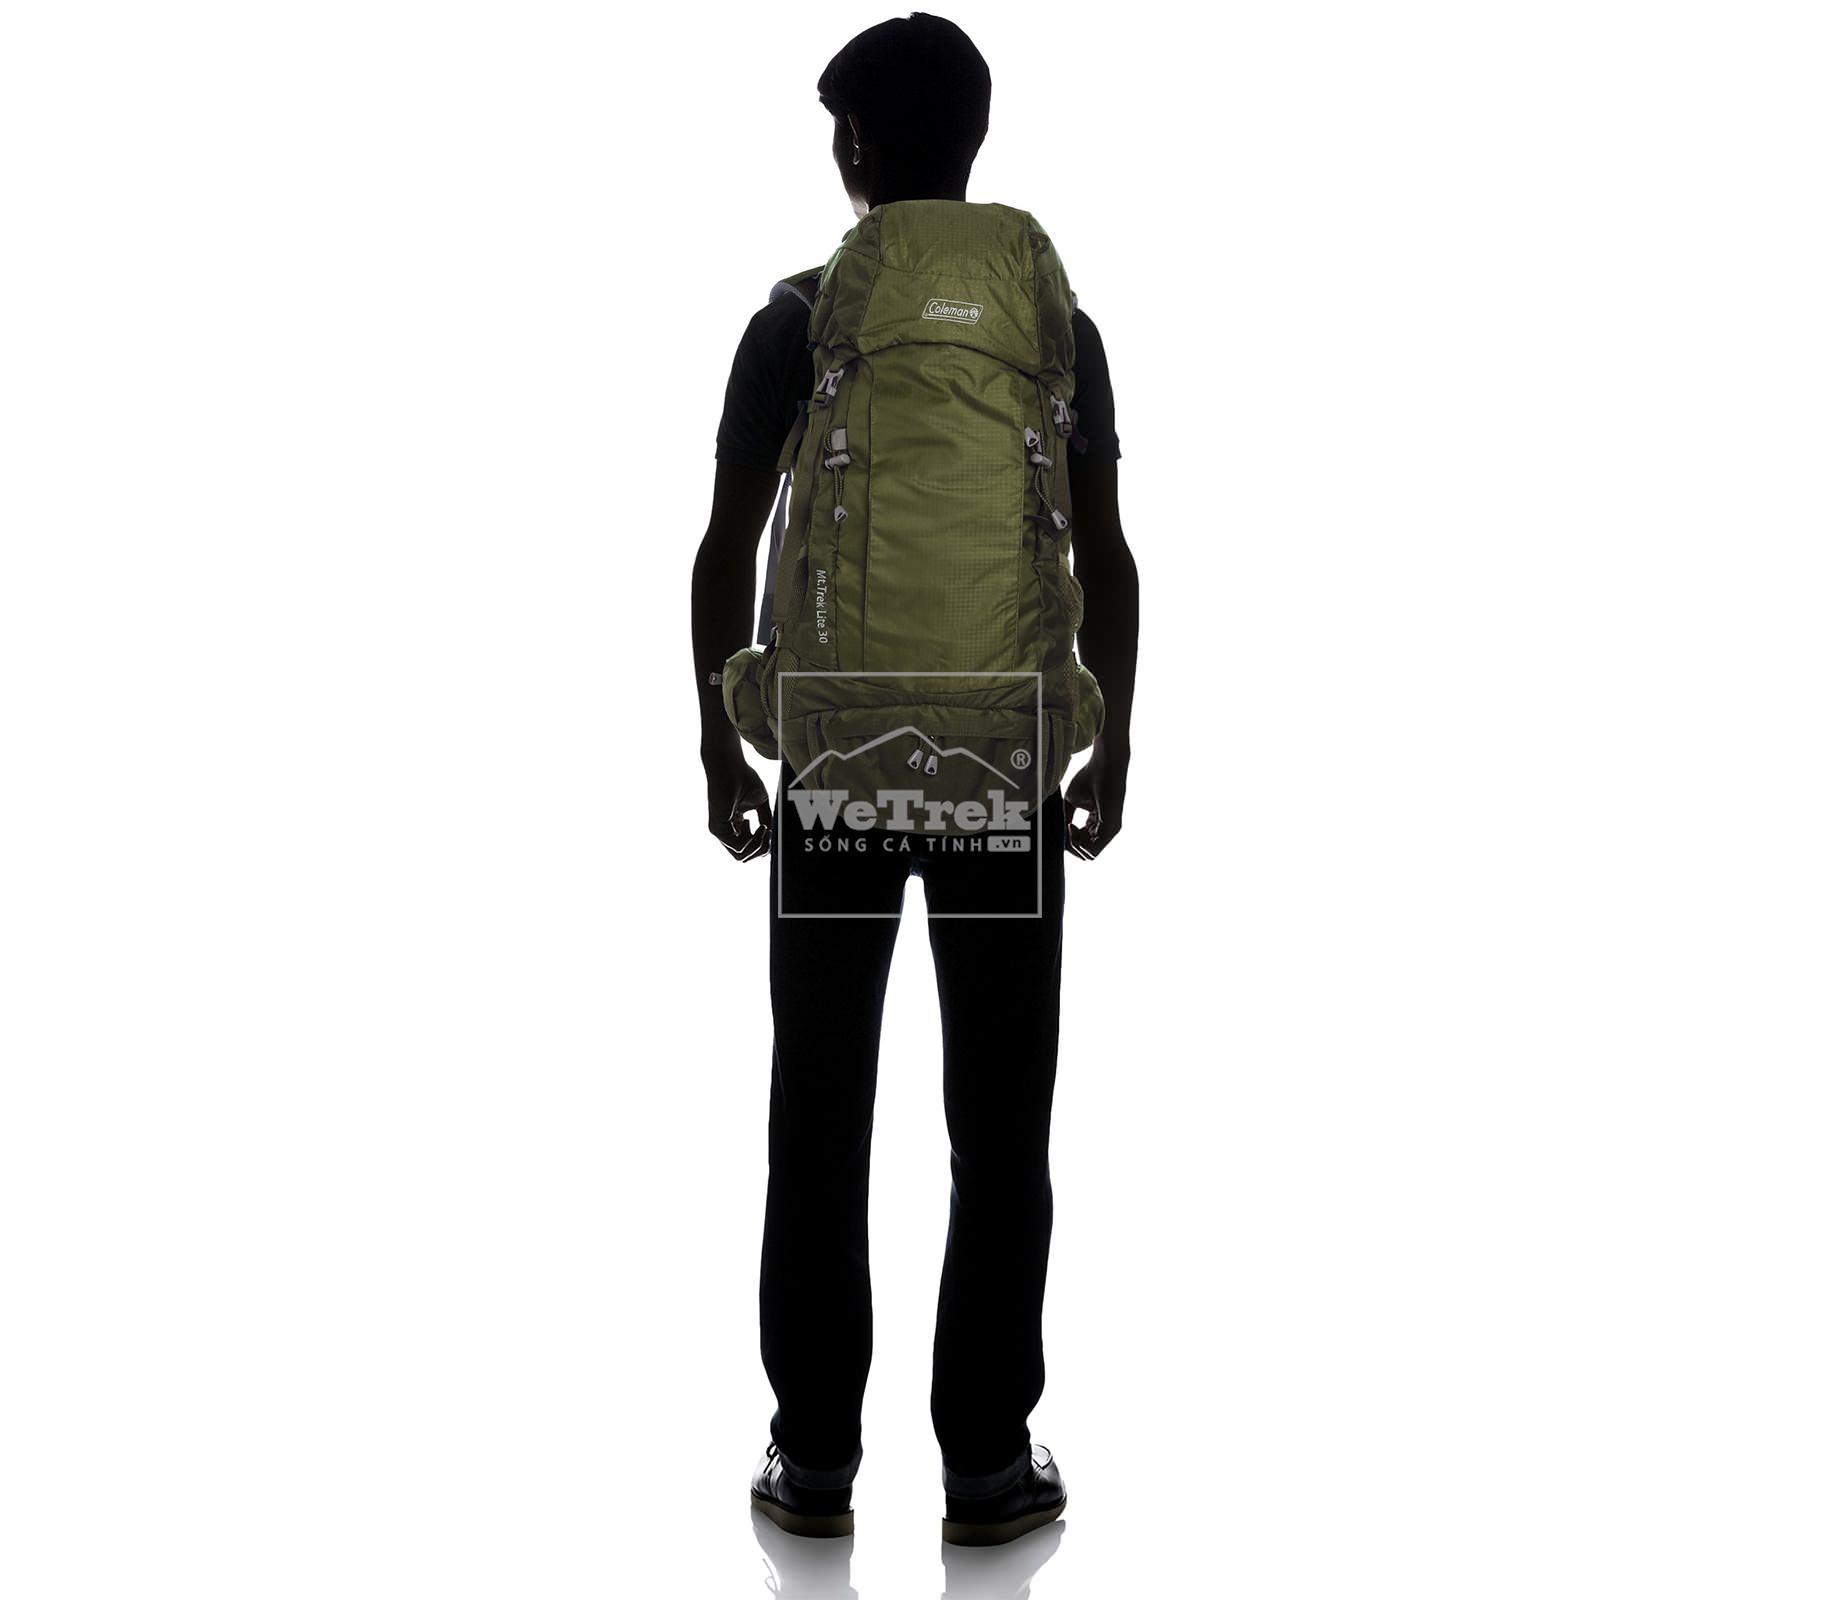 ba-lo-leo-nui-30l-coleman-mttrek-lite-backpack-green-cbb4071gr-7458-wetrek.vn-2